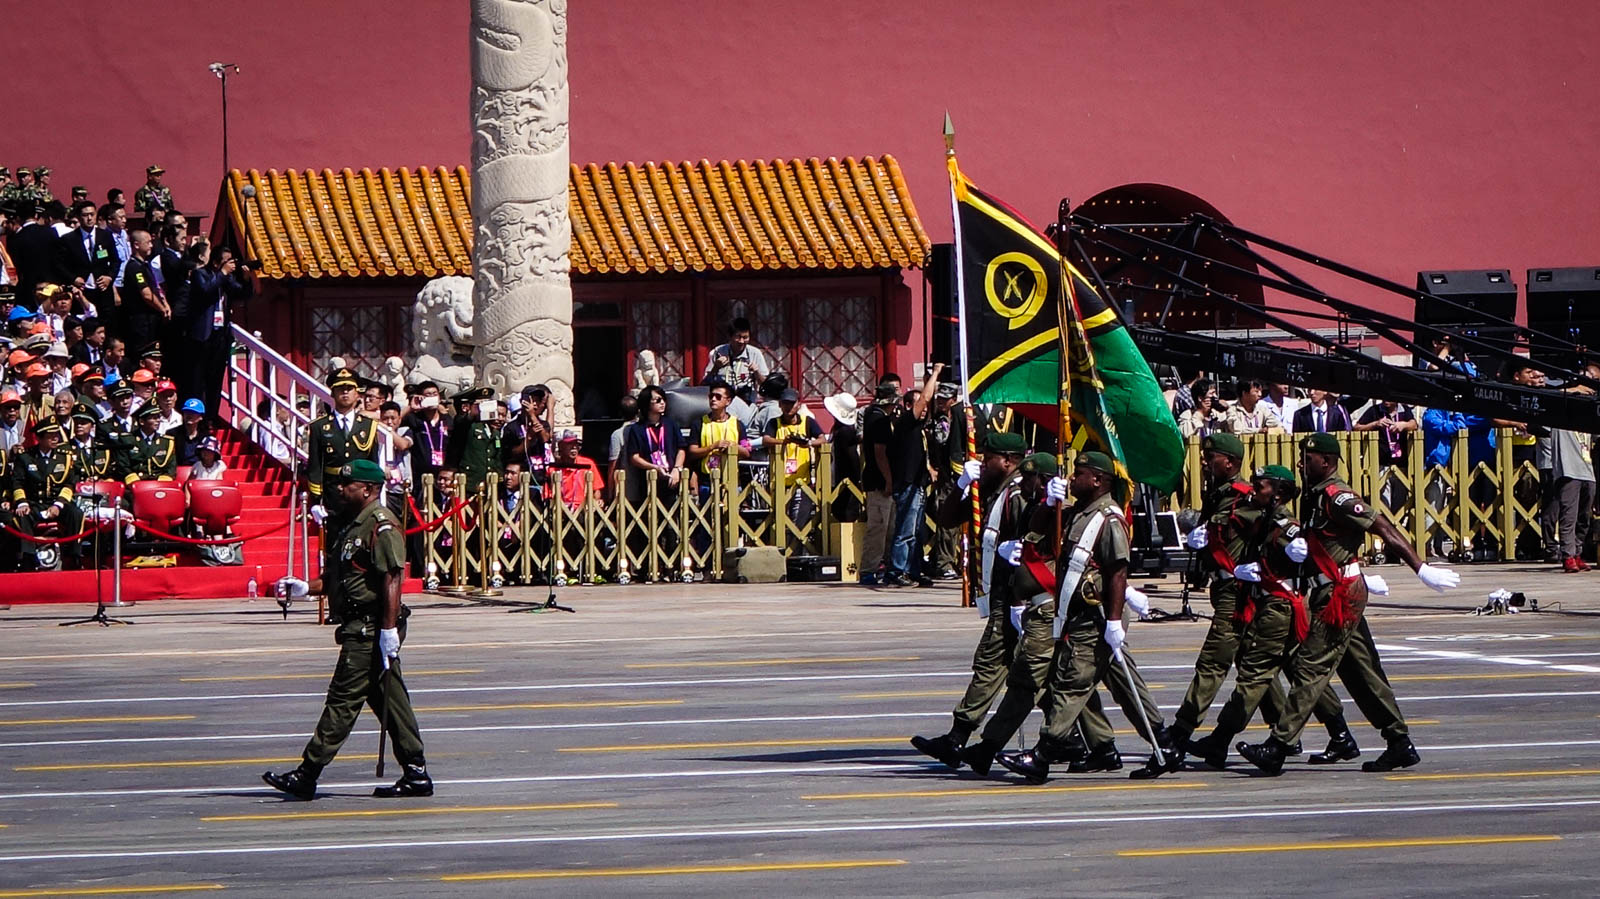 beijing-china-military-parade-2015-25